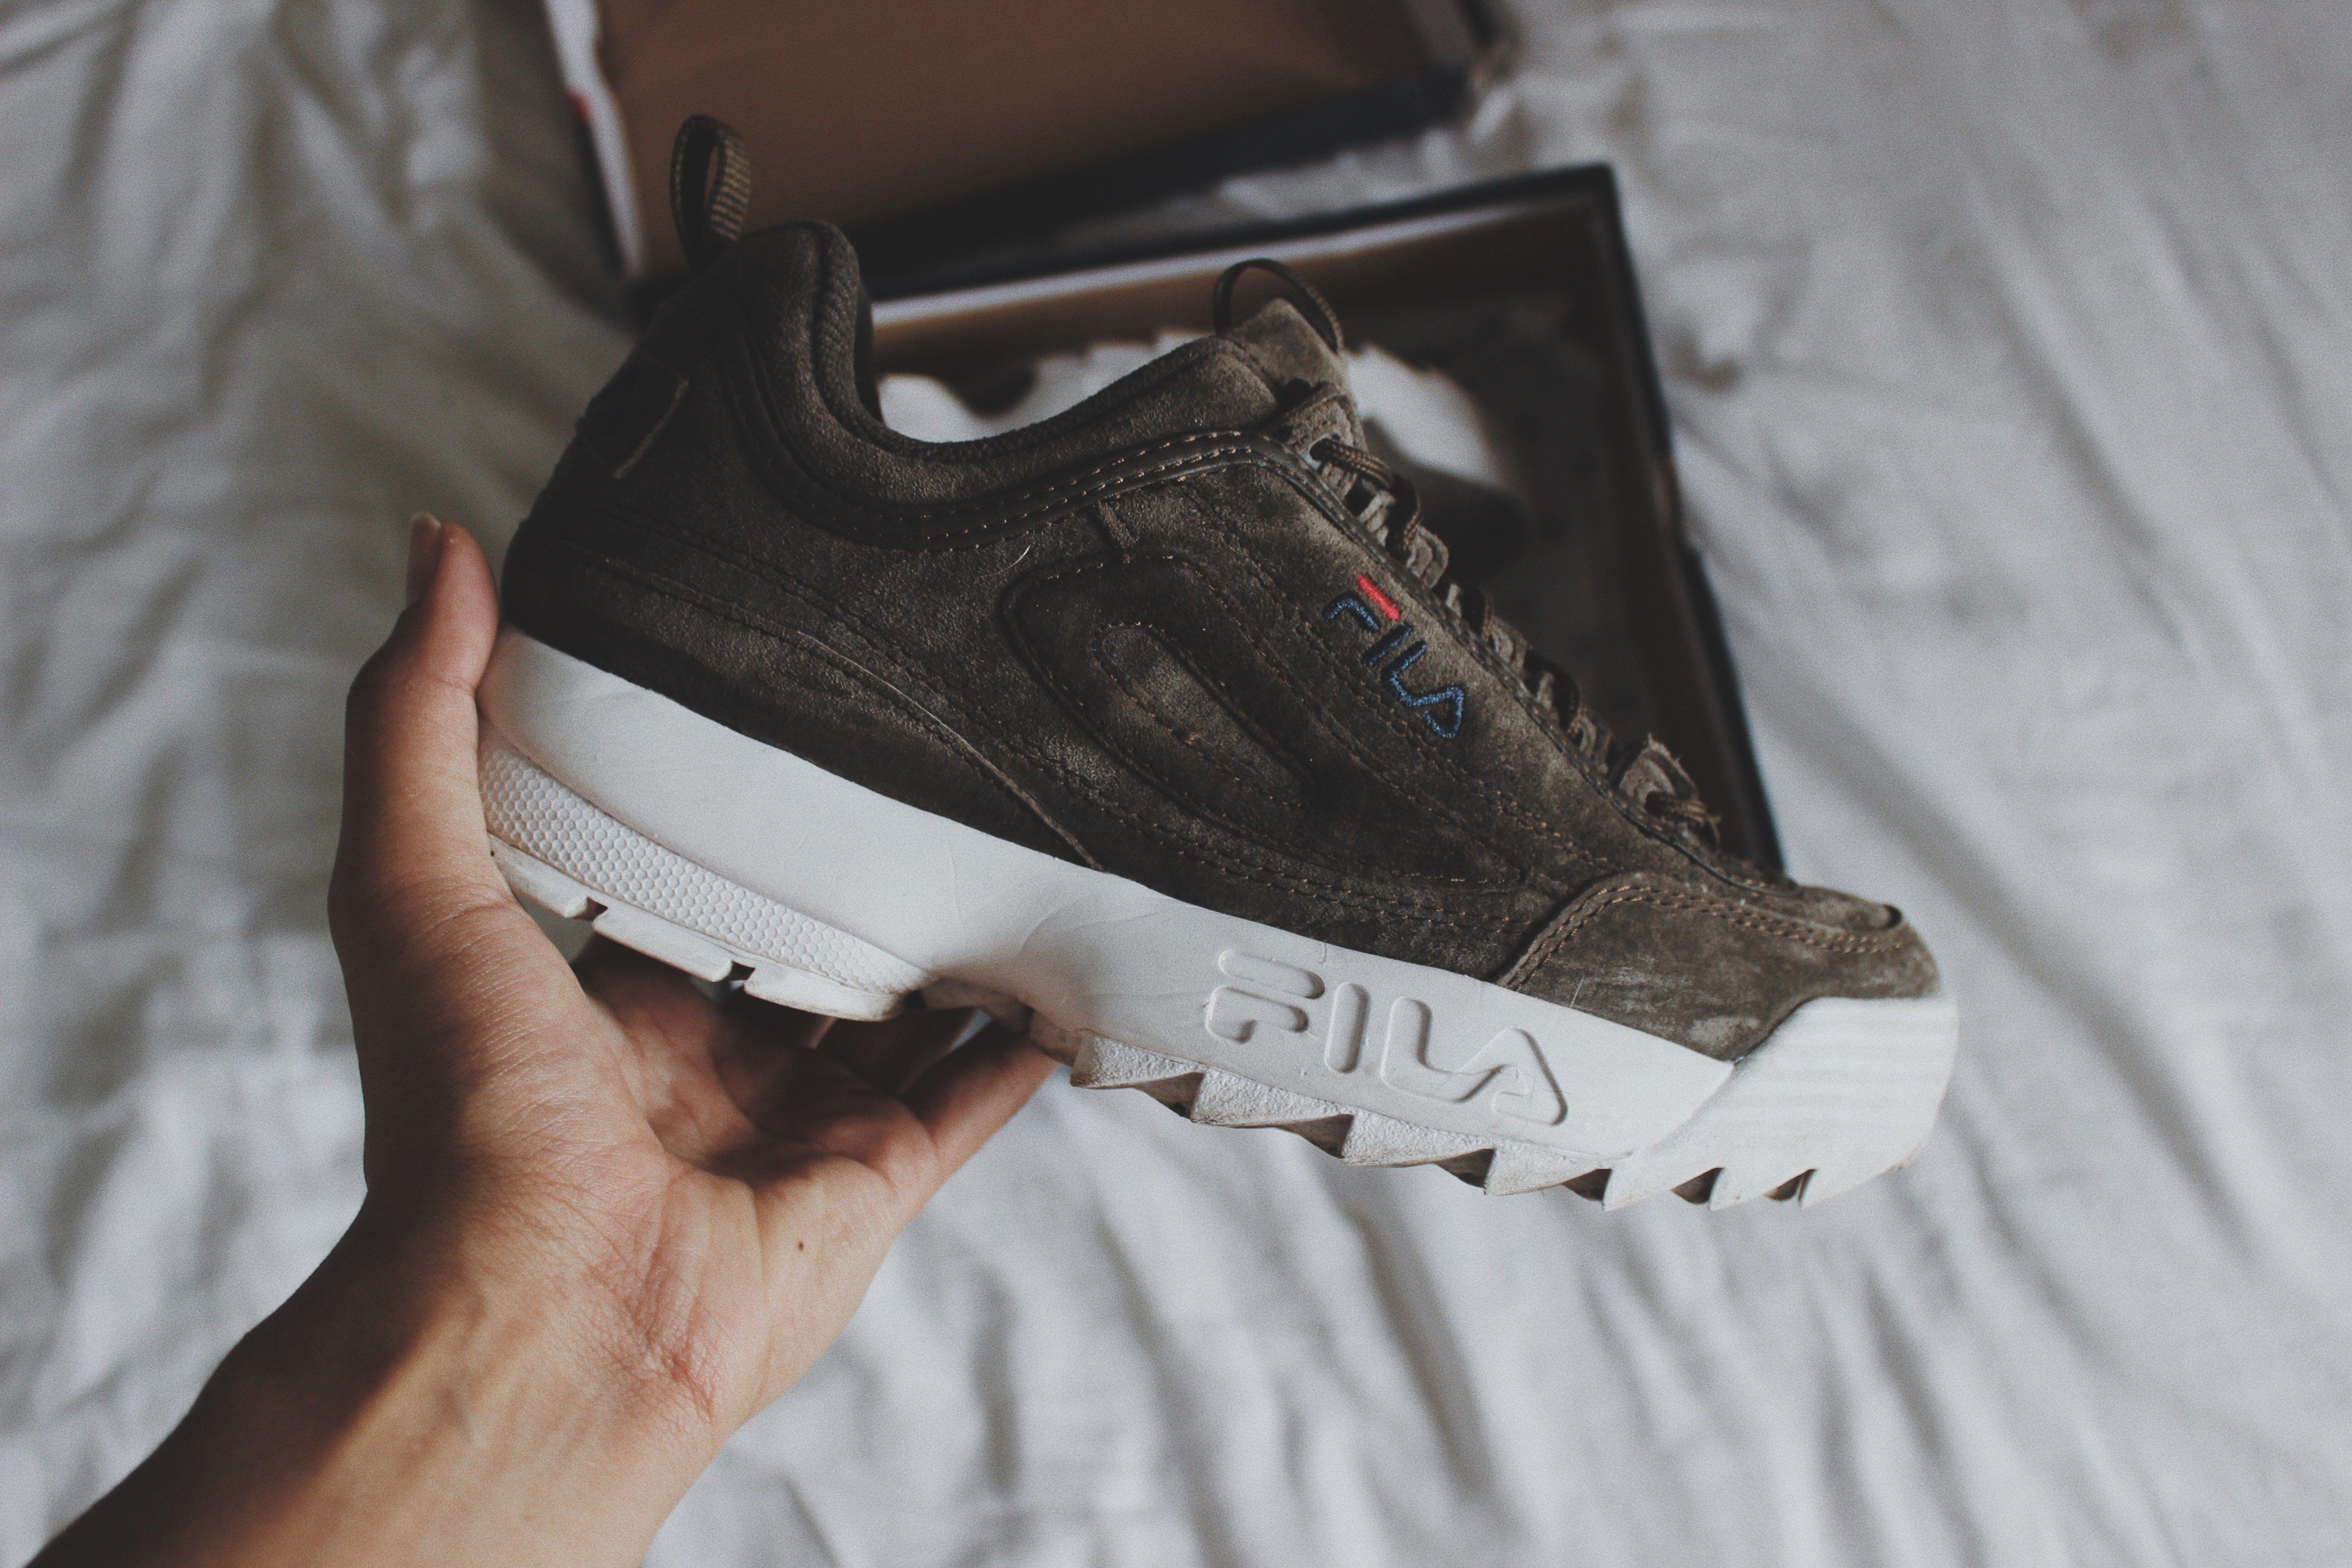 Sneakers Fila Night Ma Collection Olive De Disruptor c3LR5qj4A